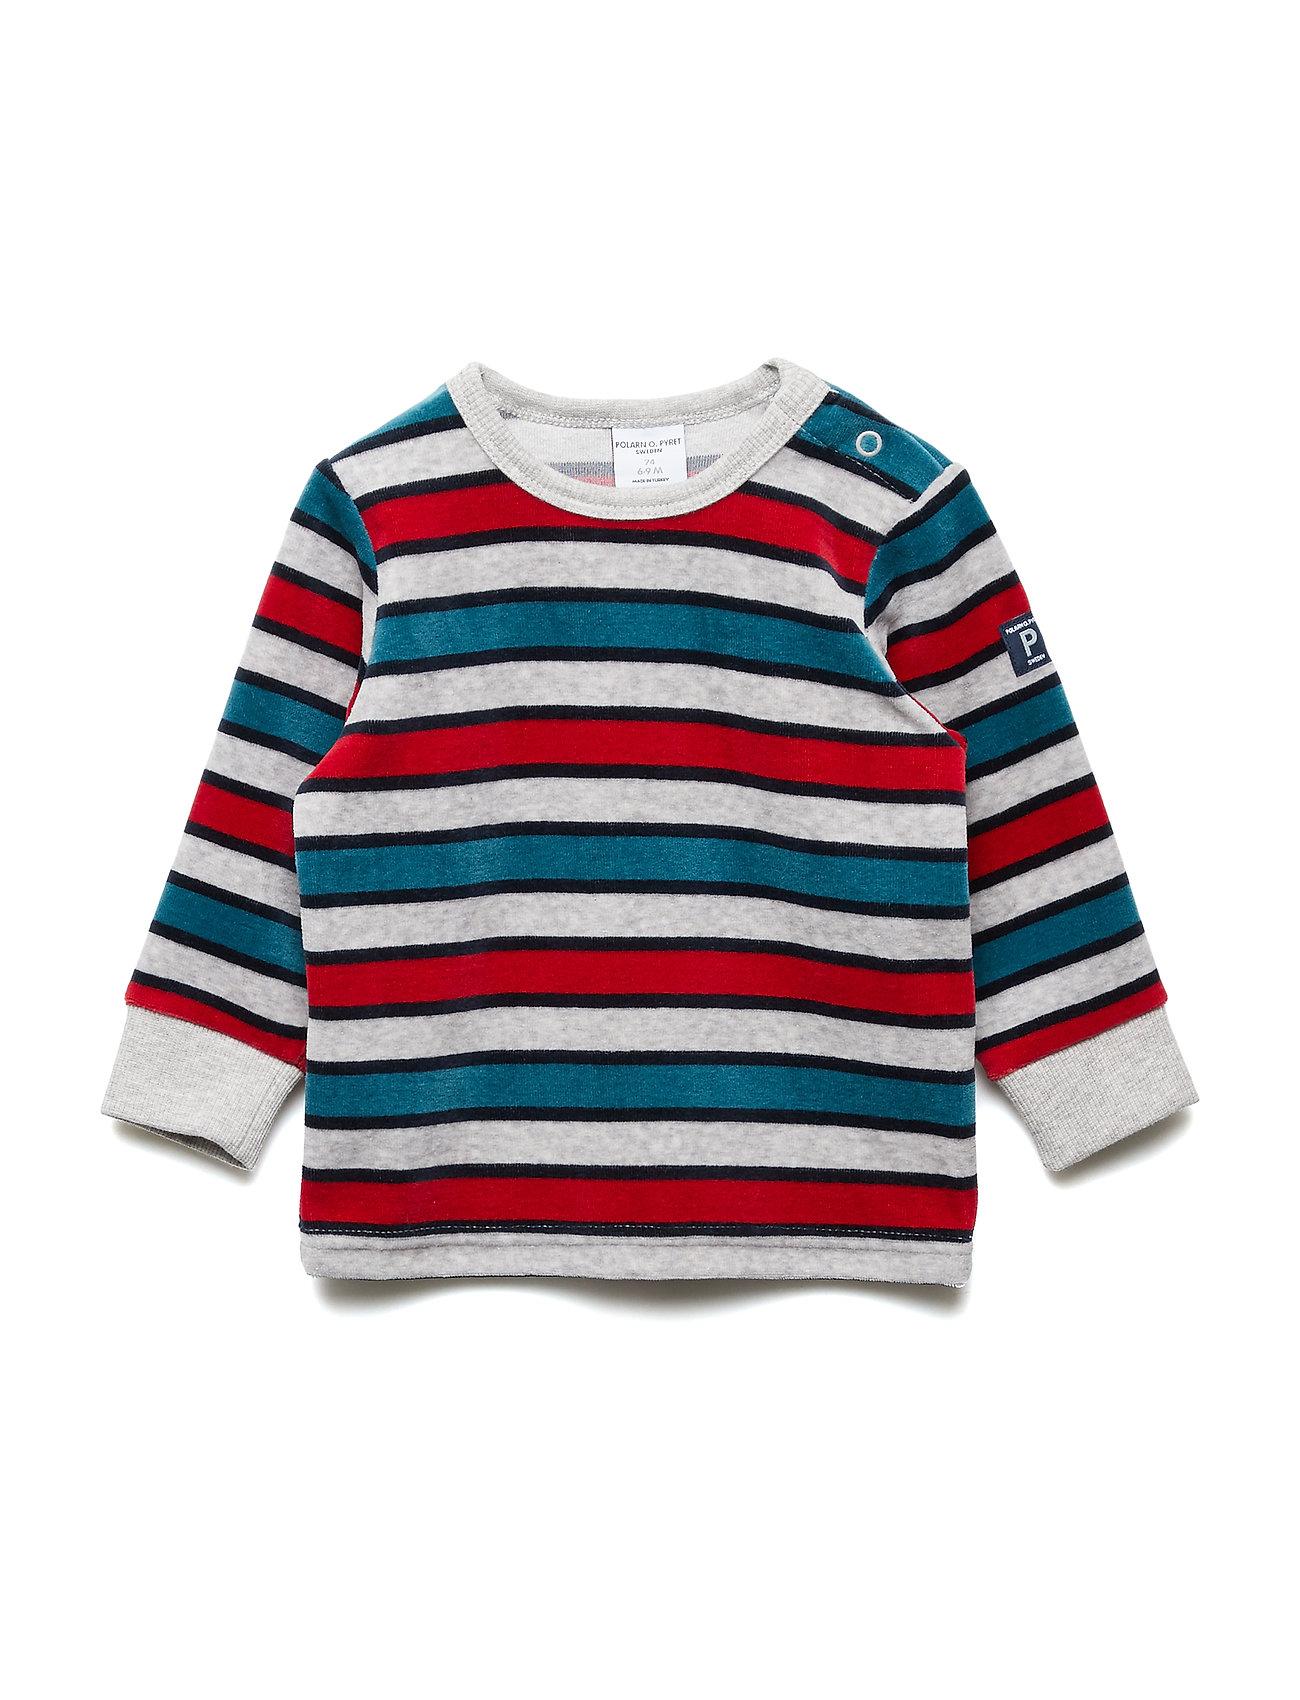 Polarn O. Pyret Velour Top Long Sleeve Striped Baby